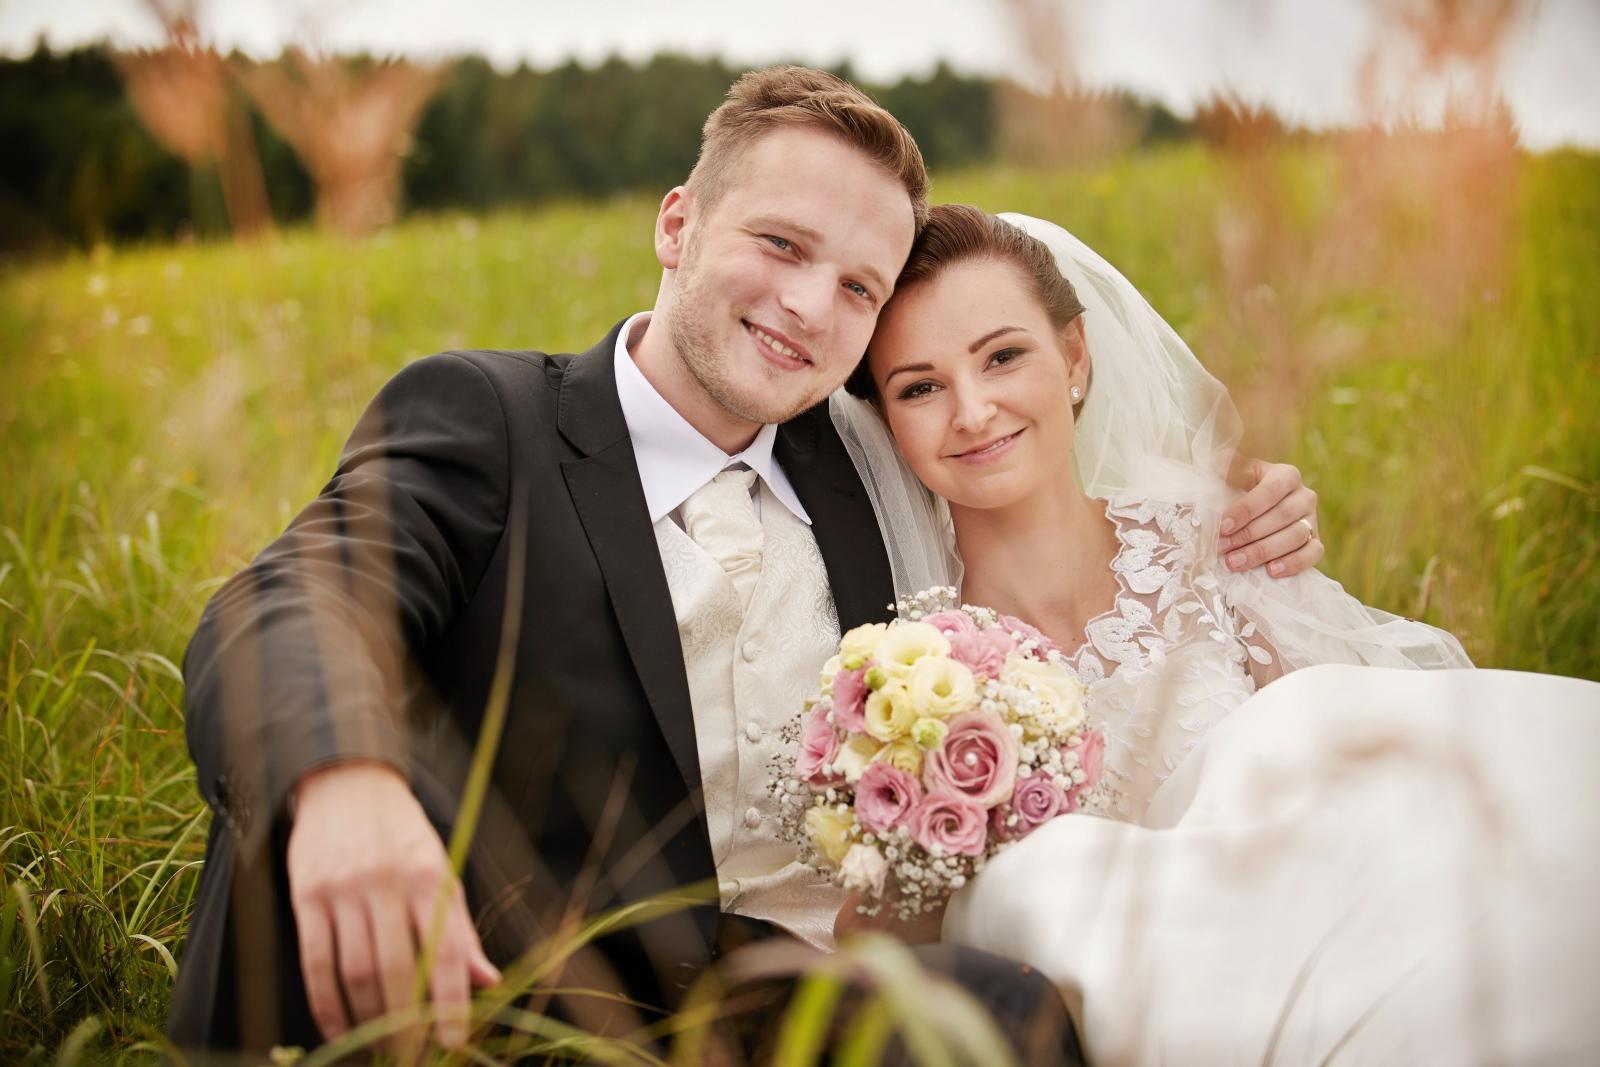 Svadba M+M - Obrázok č. 1